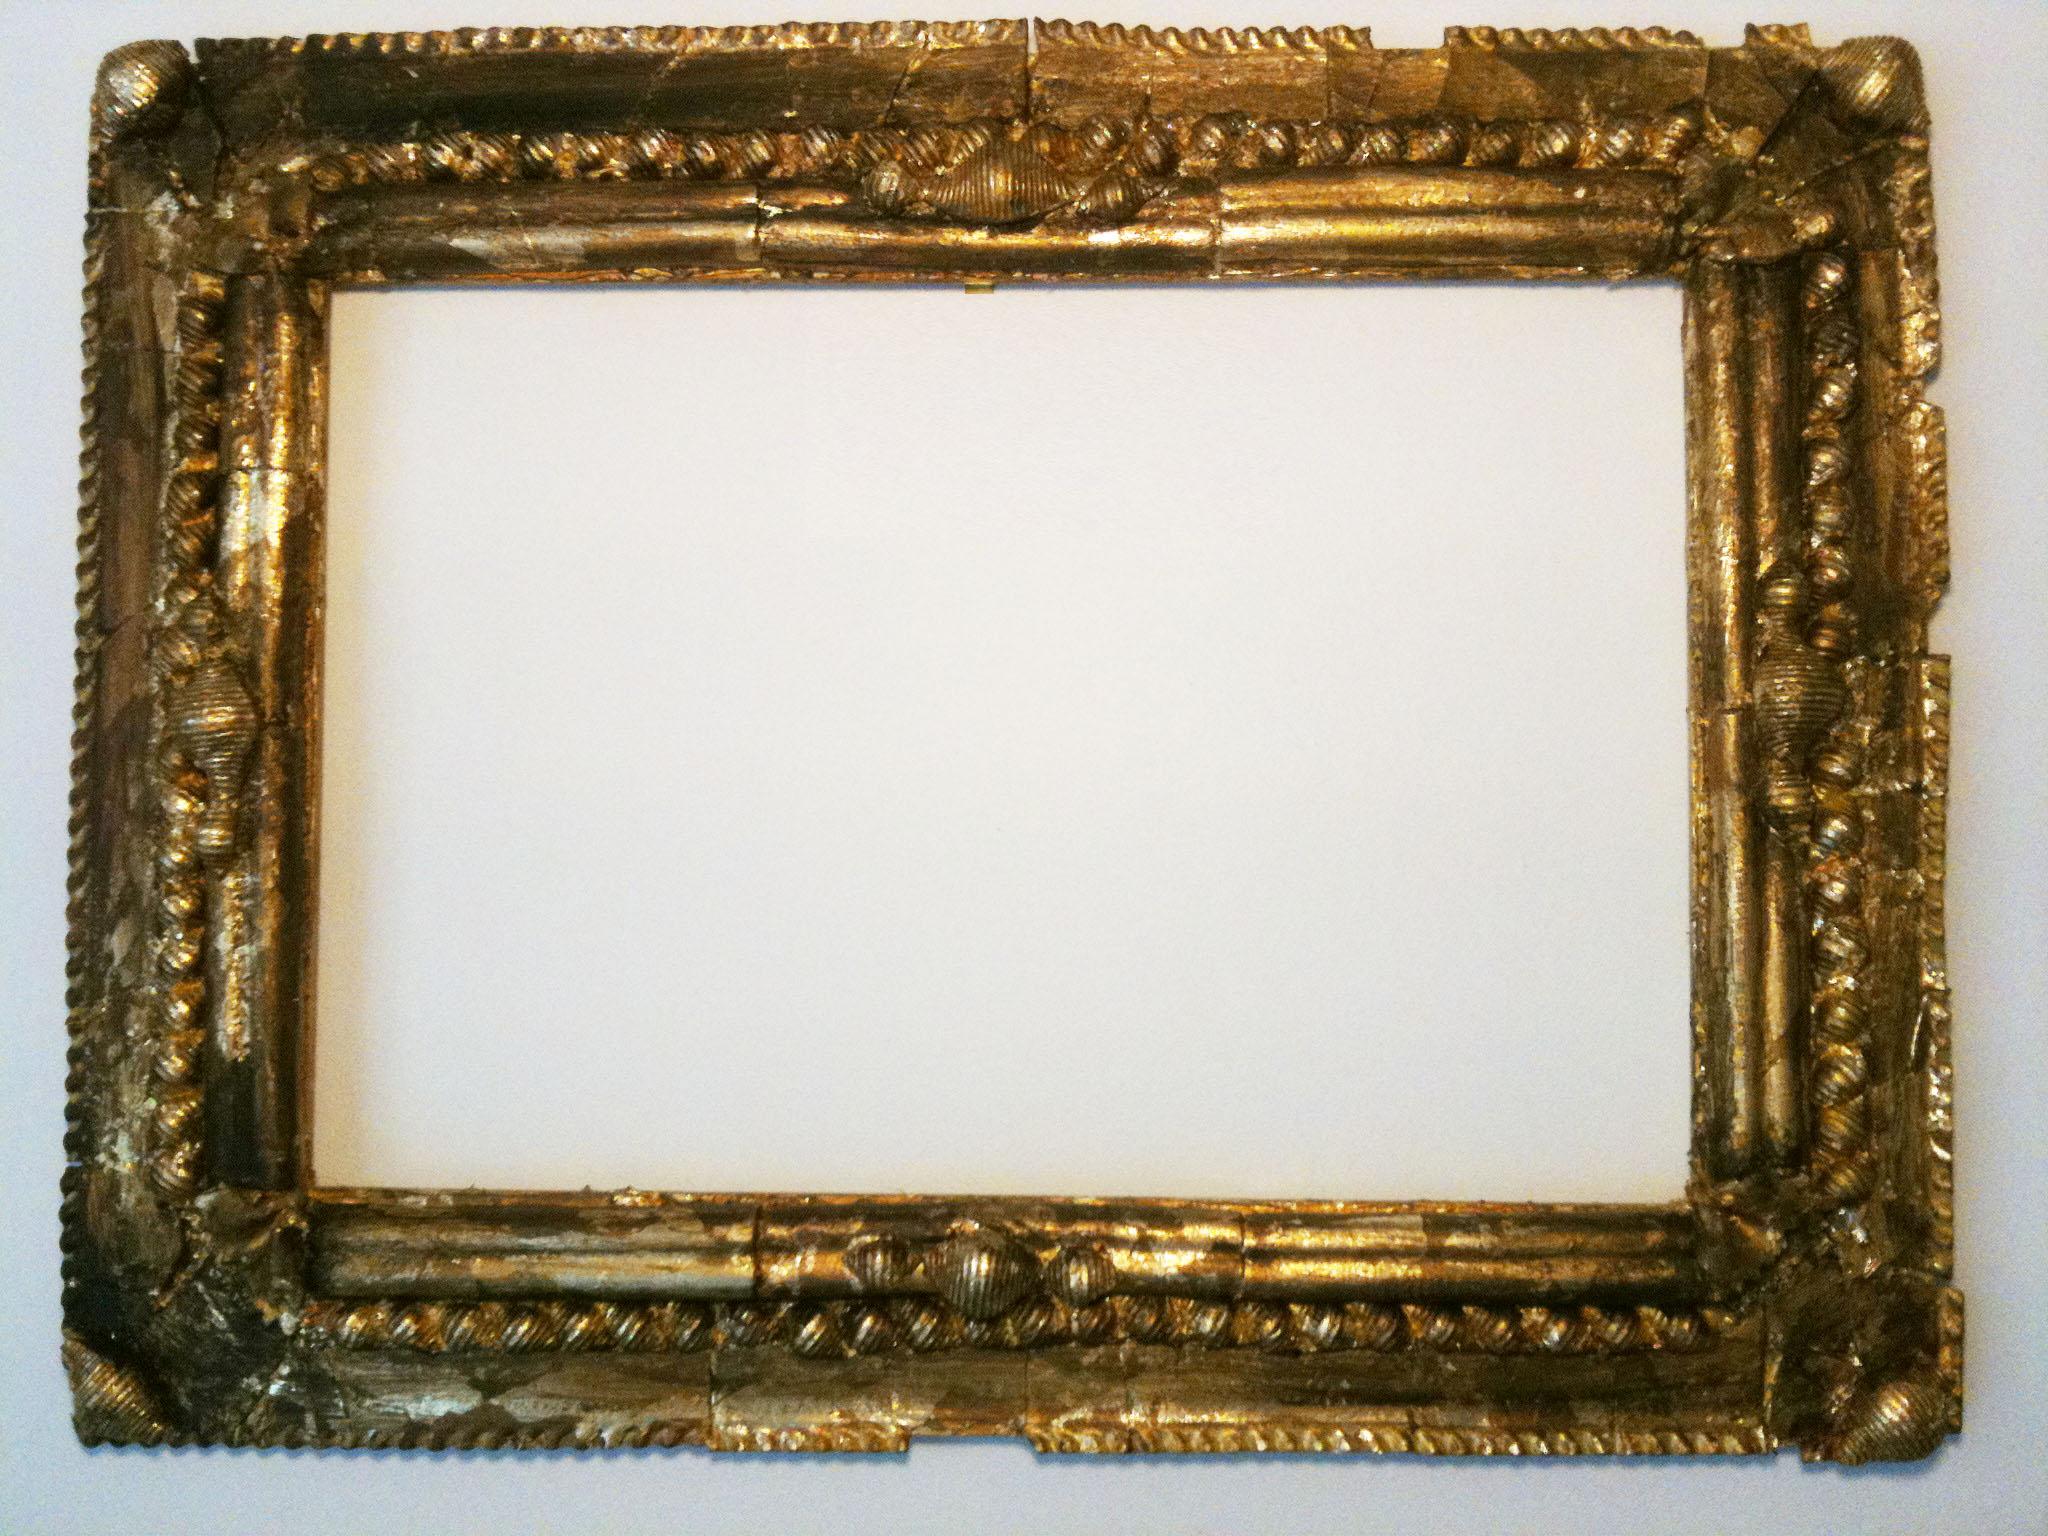 pasta frame – EDMUND IFFLAND